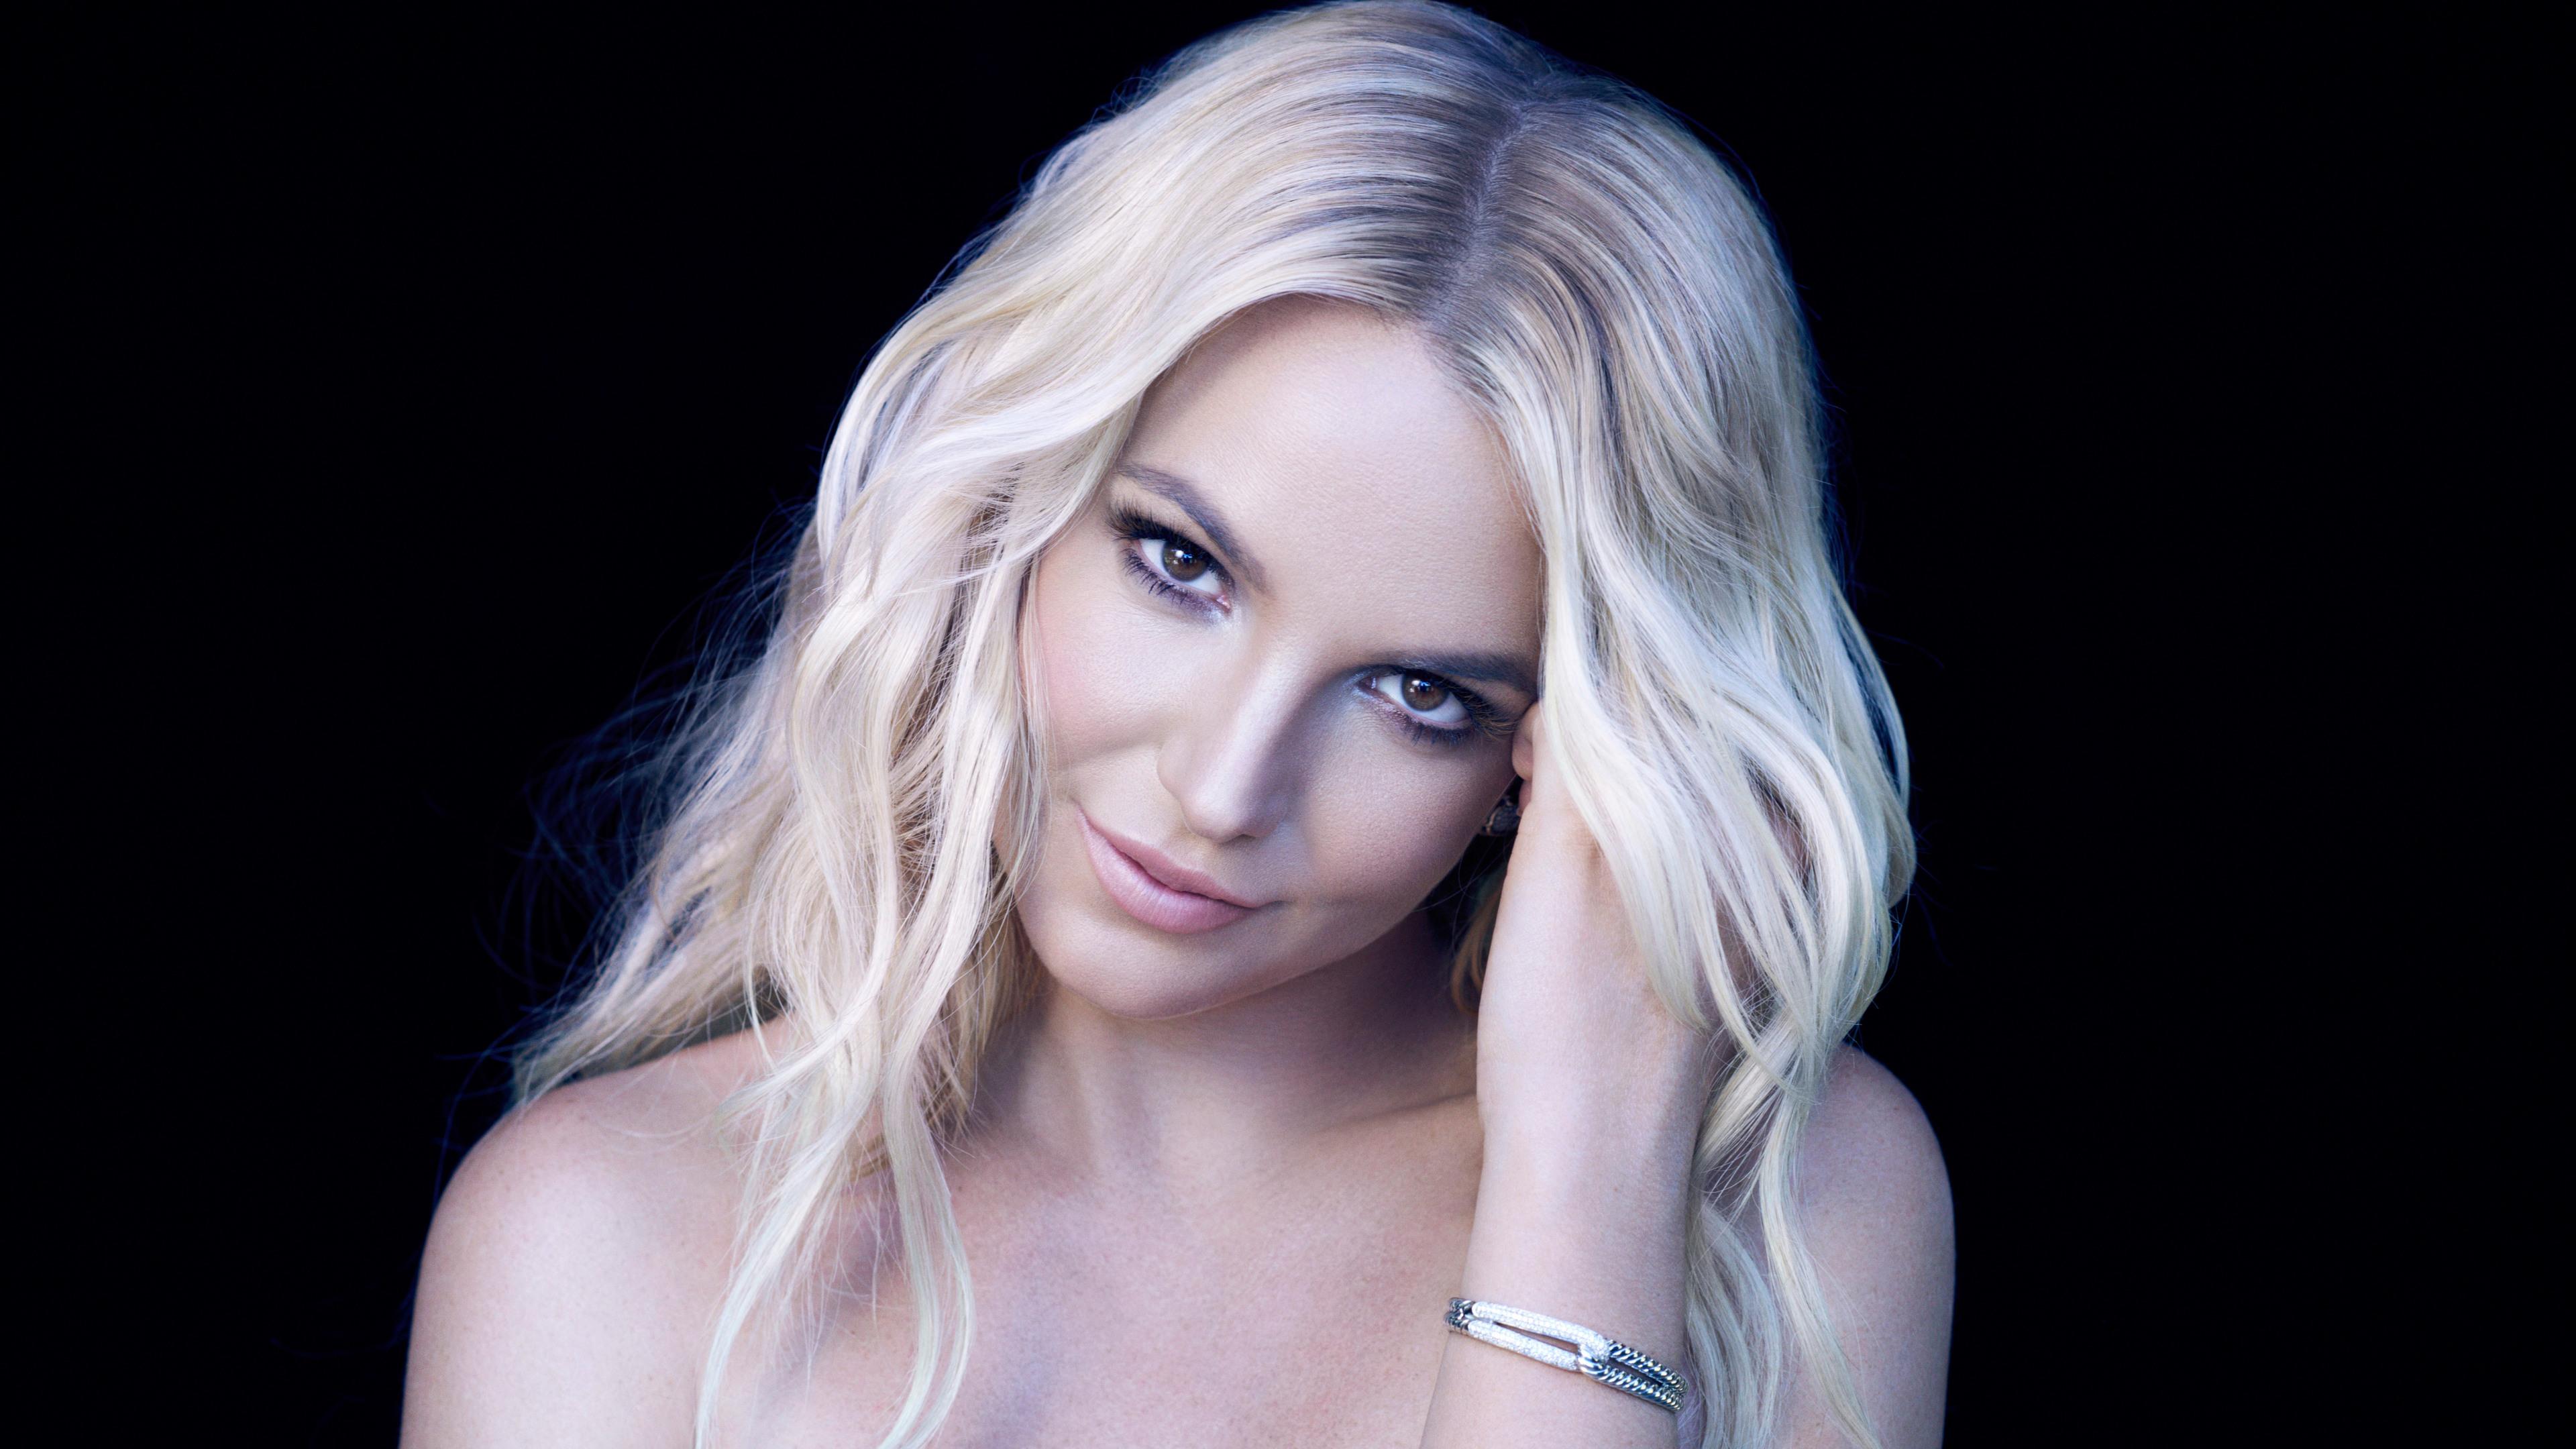 britney spears 8k 1536857538 - Britney Spears 8k - girls wallpapers, celebrities wallpapers, britney spears wallpapers, 8k wallpapers